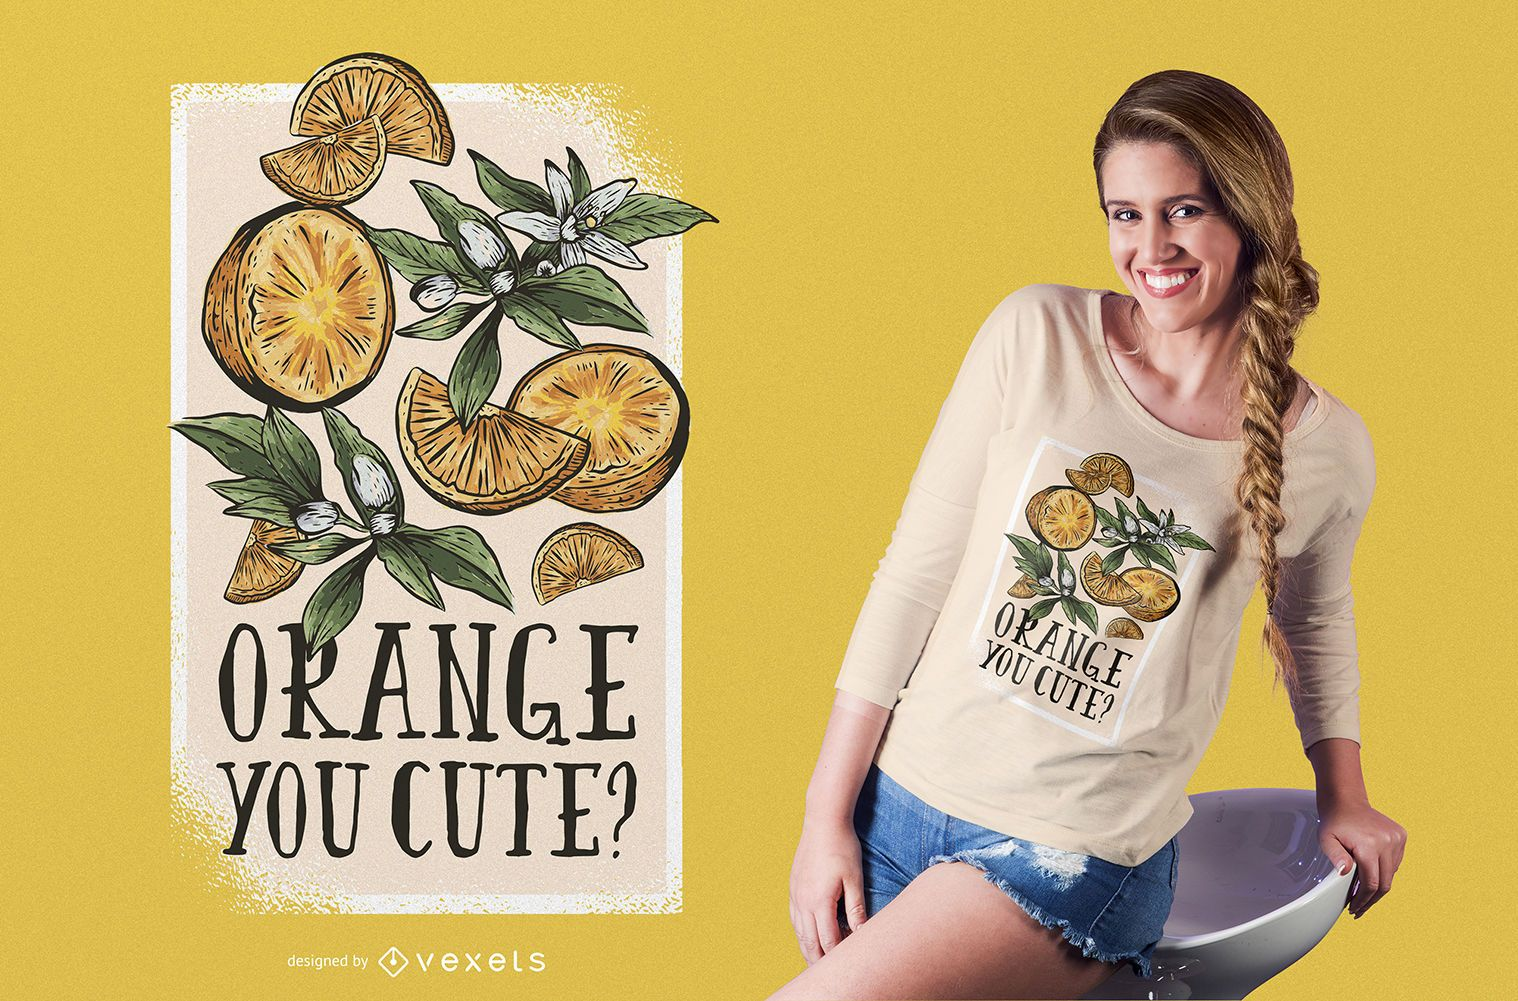 Orange you cute t-shirt design